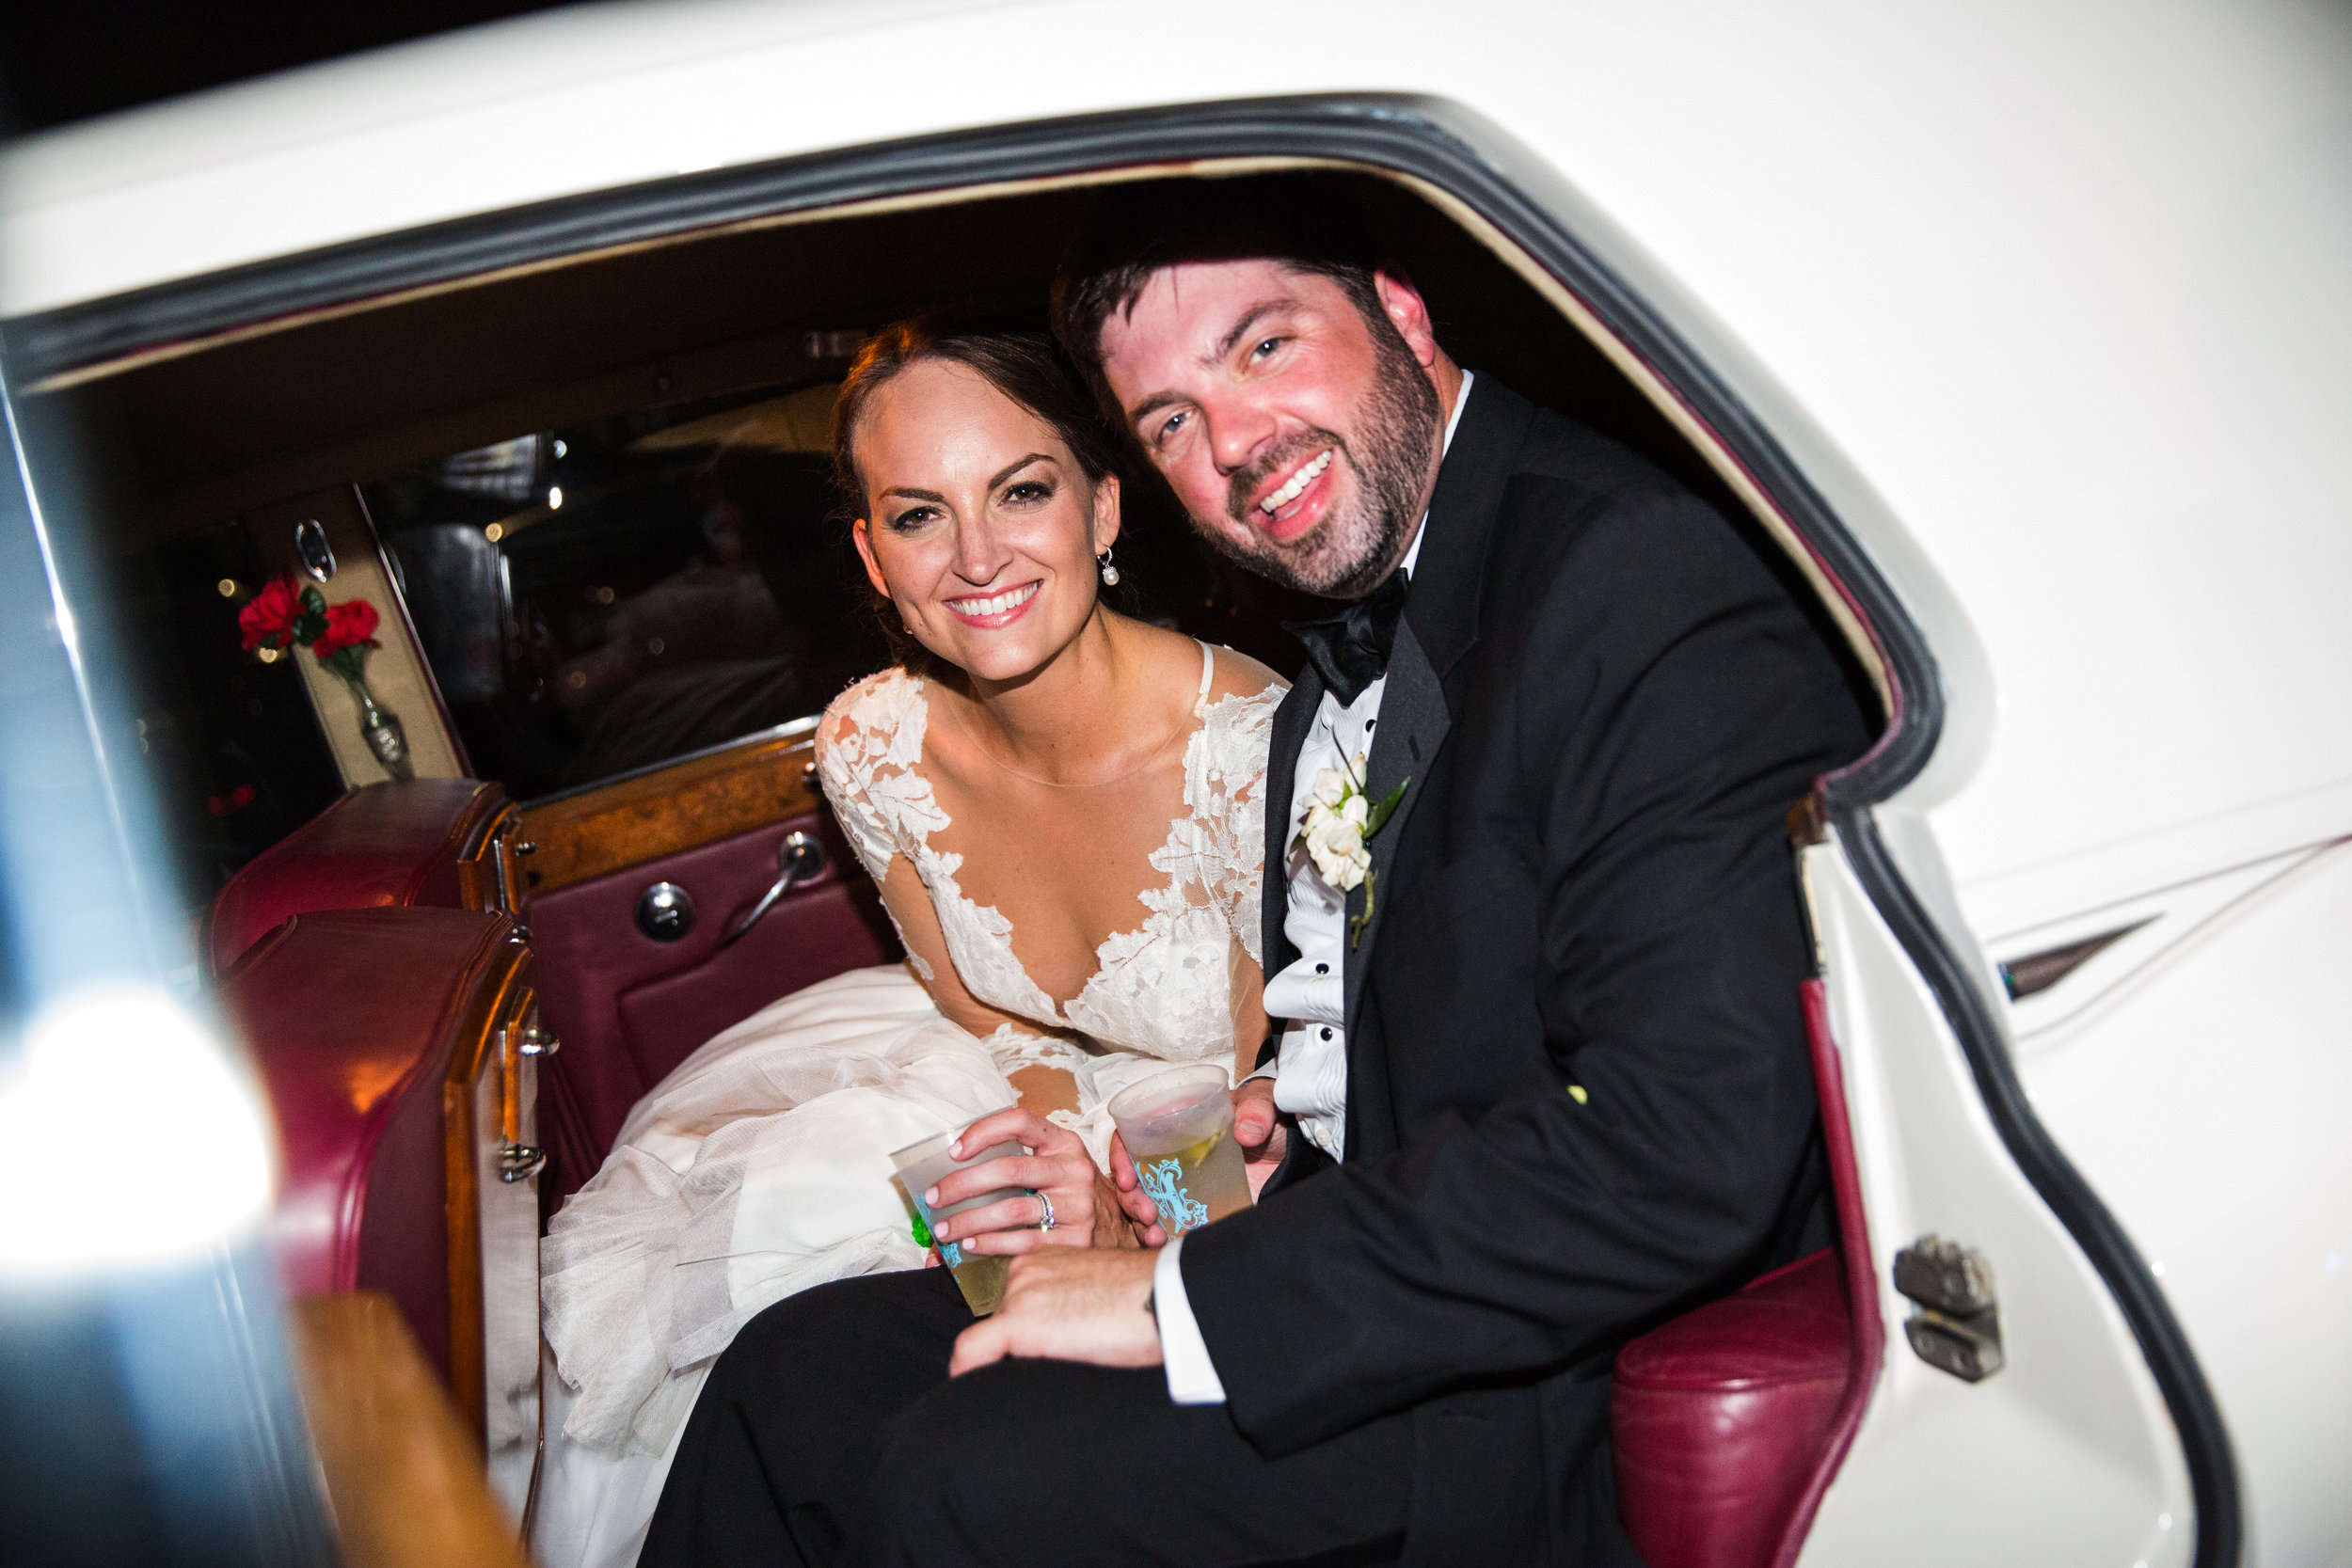 Paige&TreyWED_679_COLOR.jpg